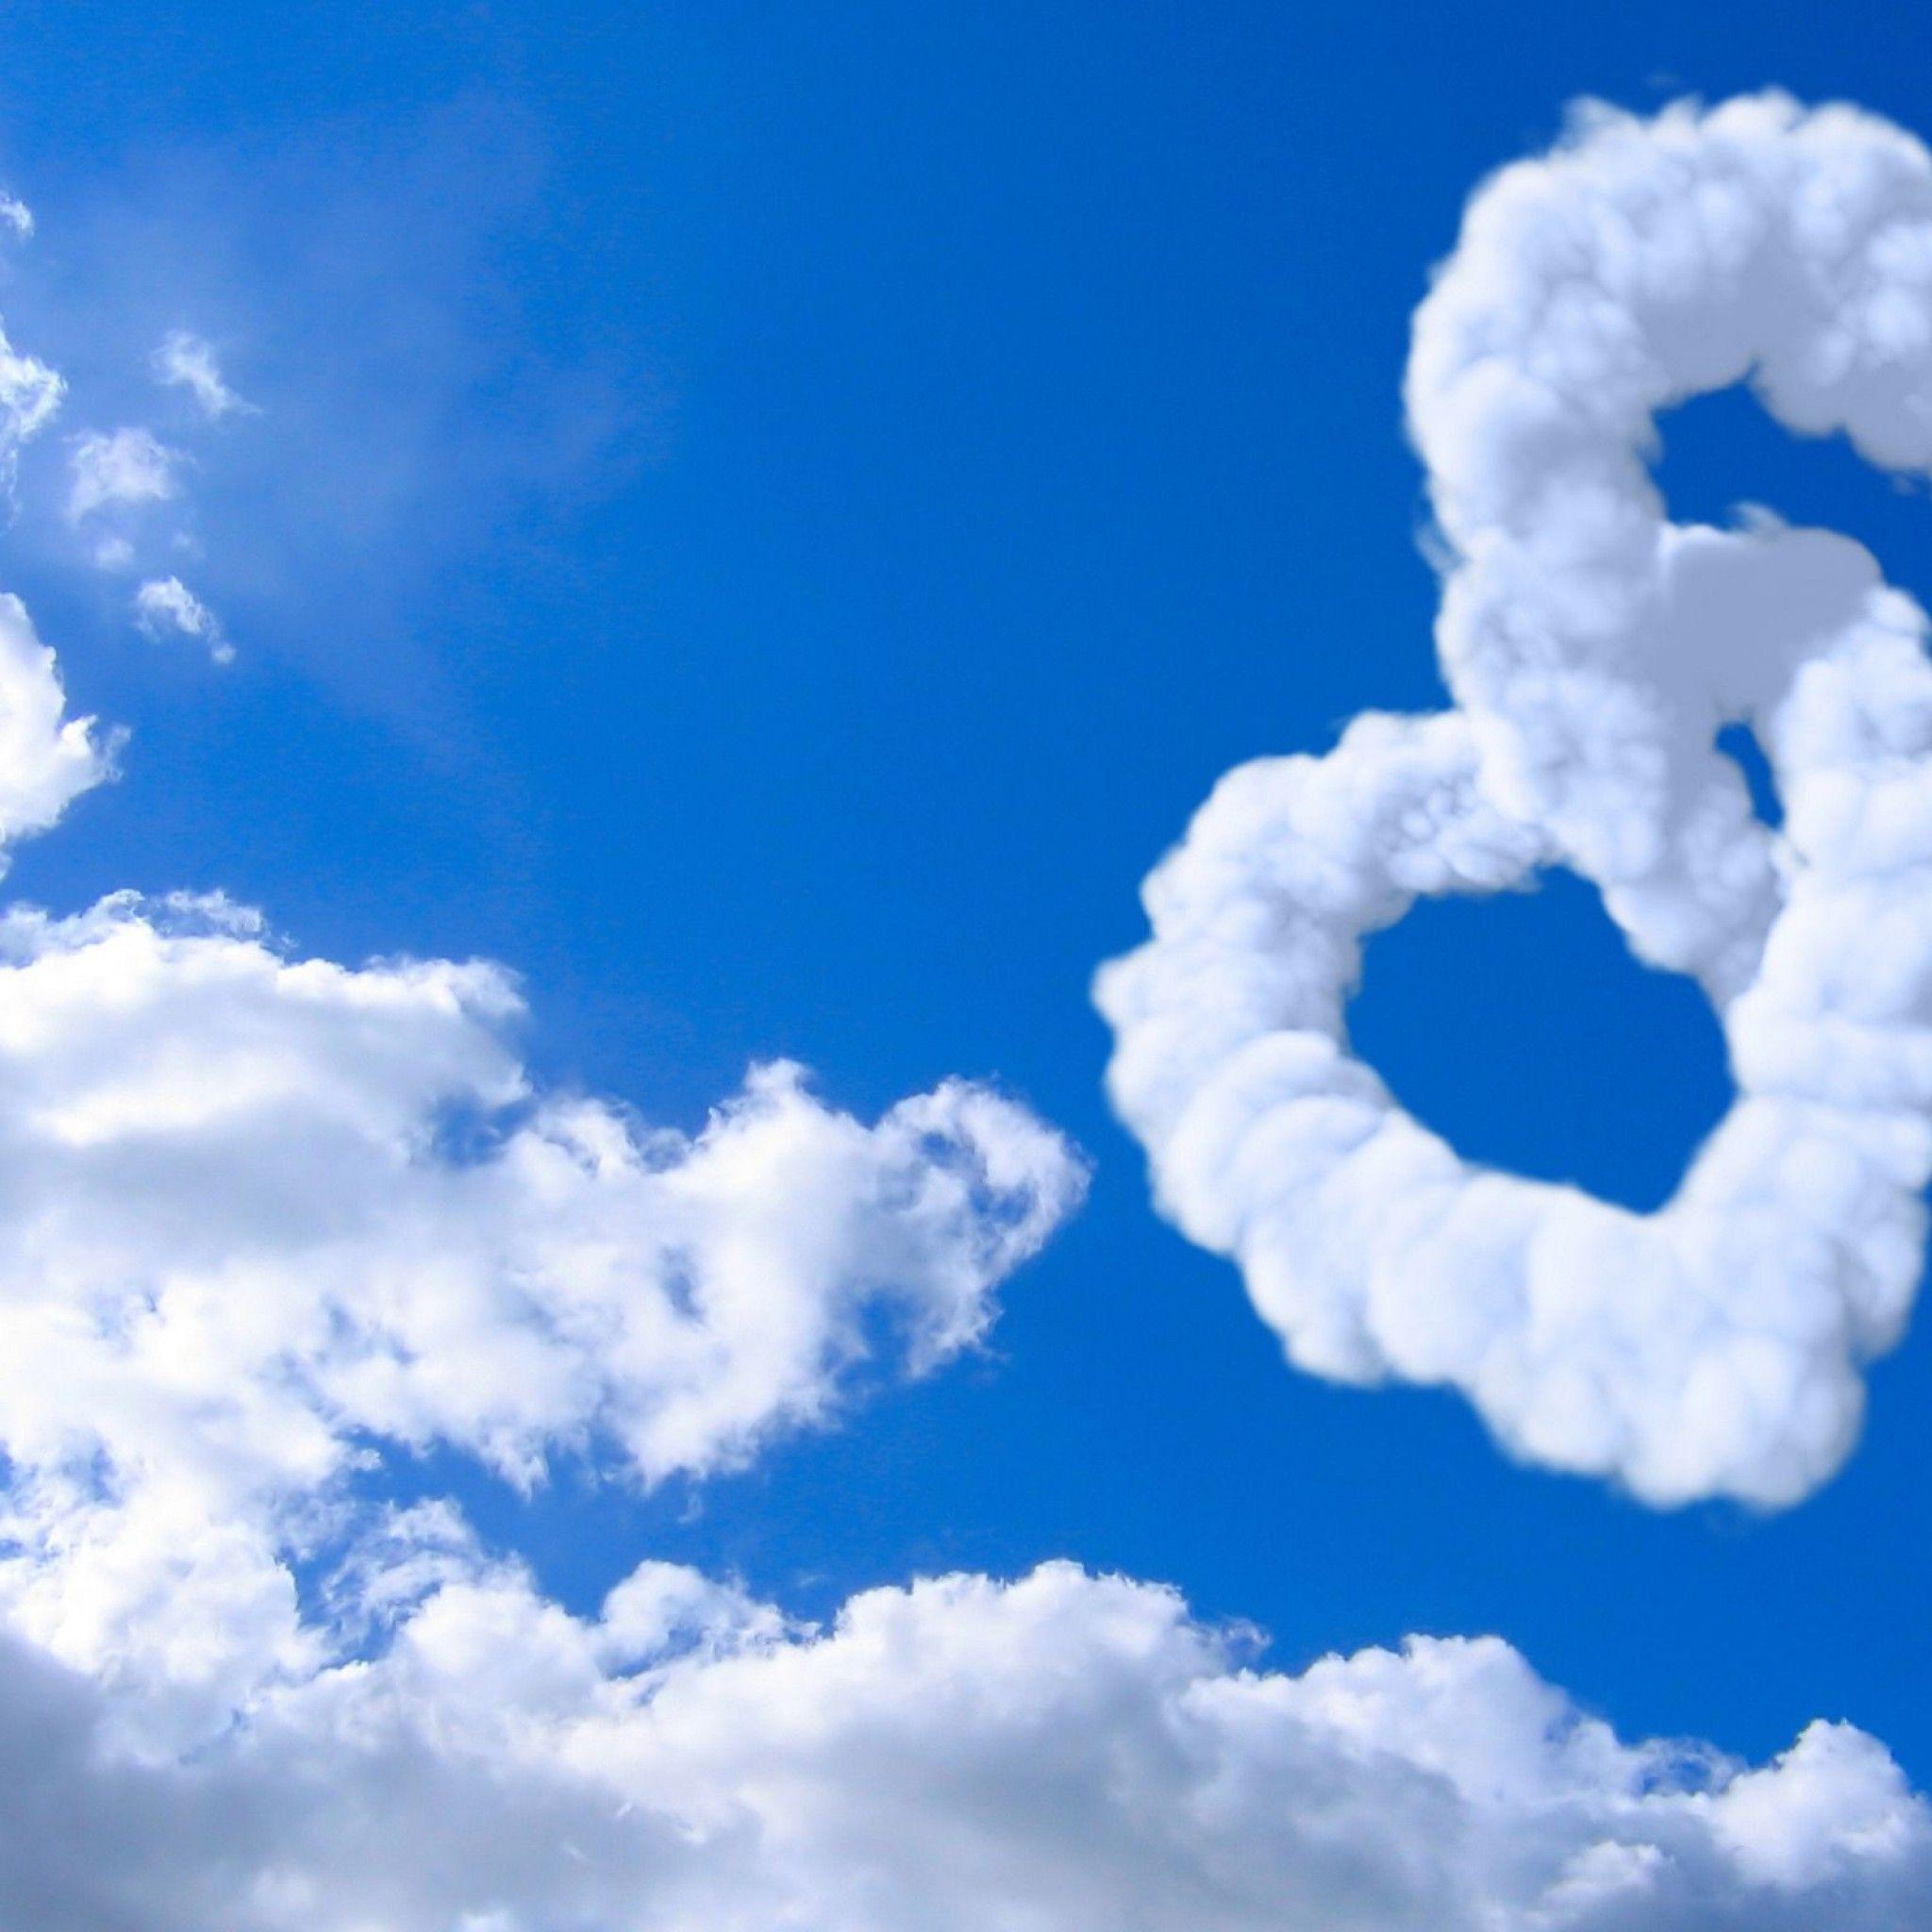 love heart clouds in blue sky heart february s #13790 wallpaper